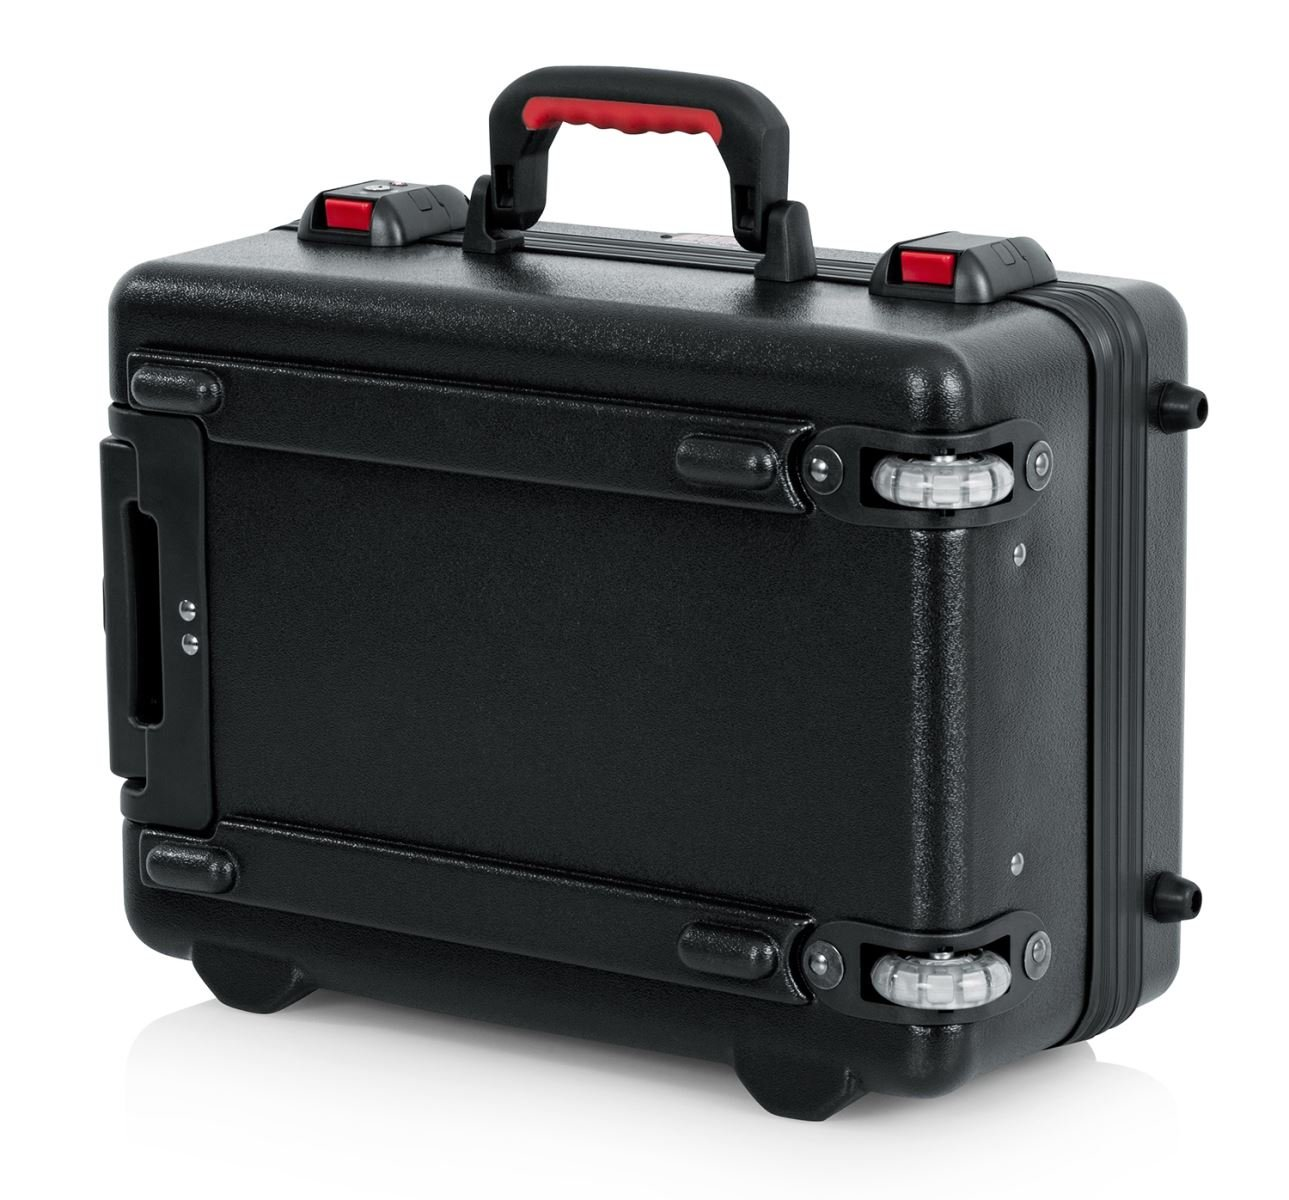 TSA Series ATA Molded Laptop/Projector Case